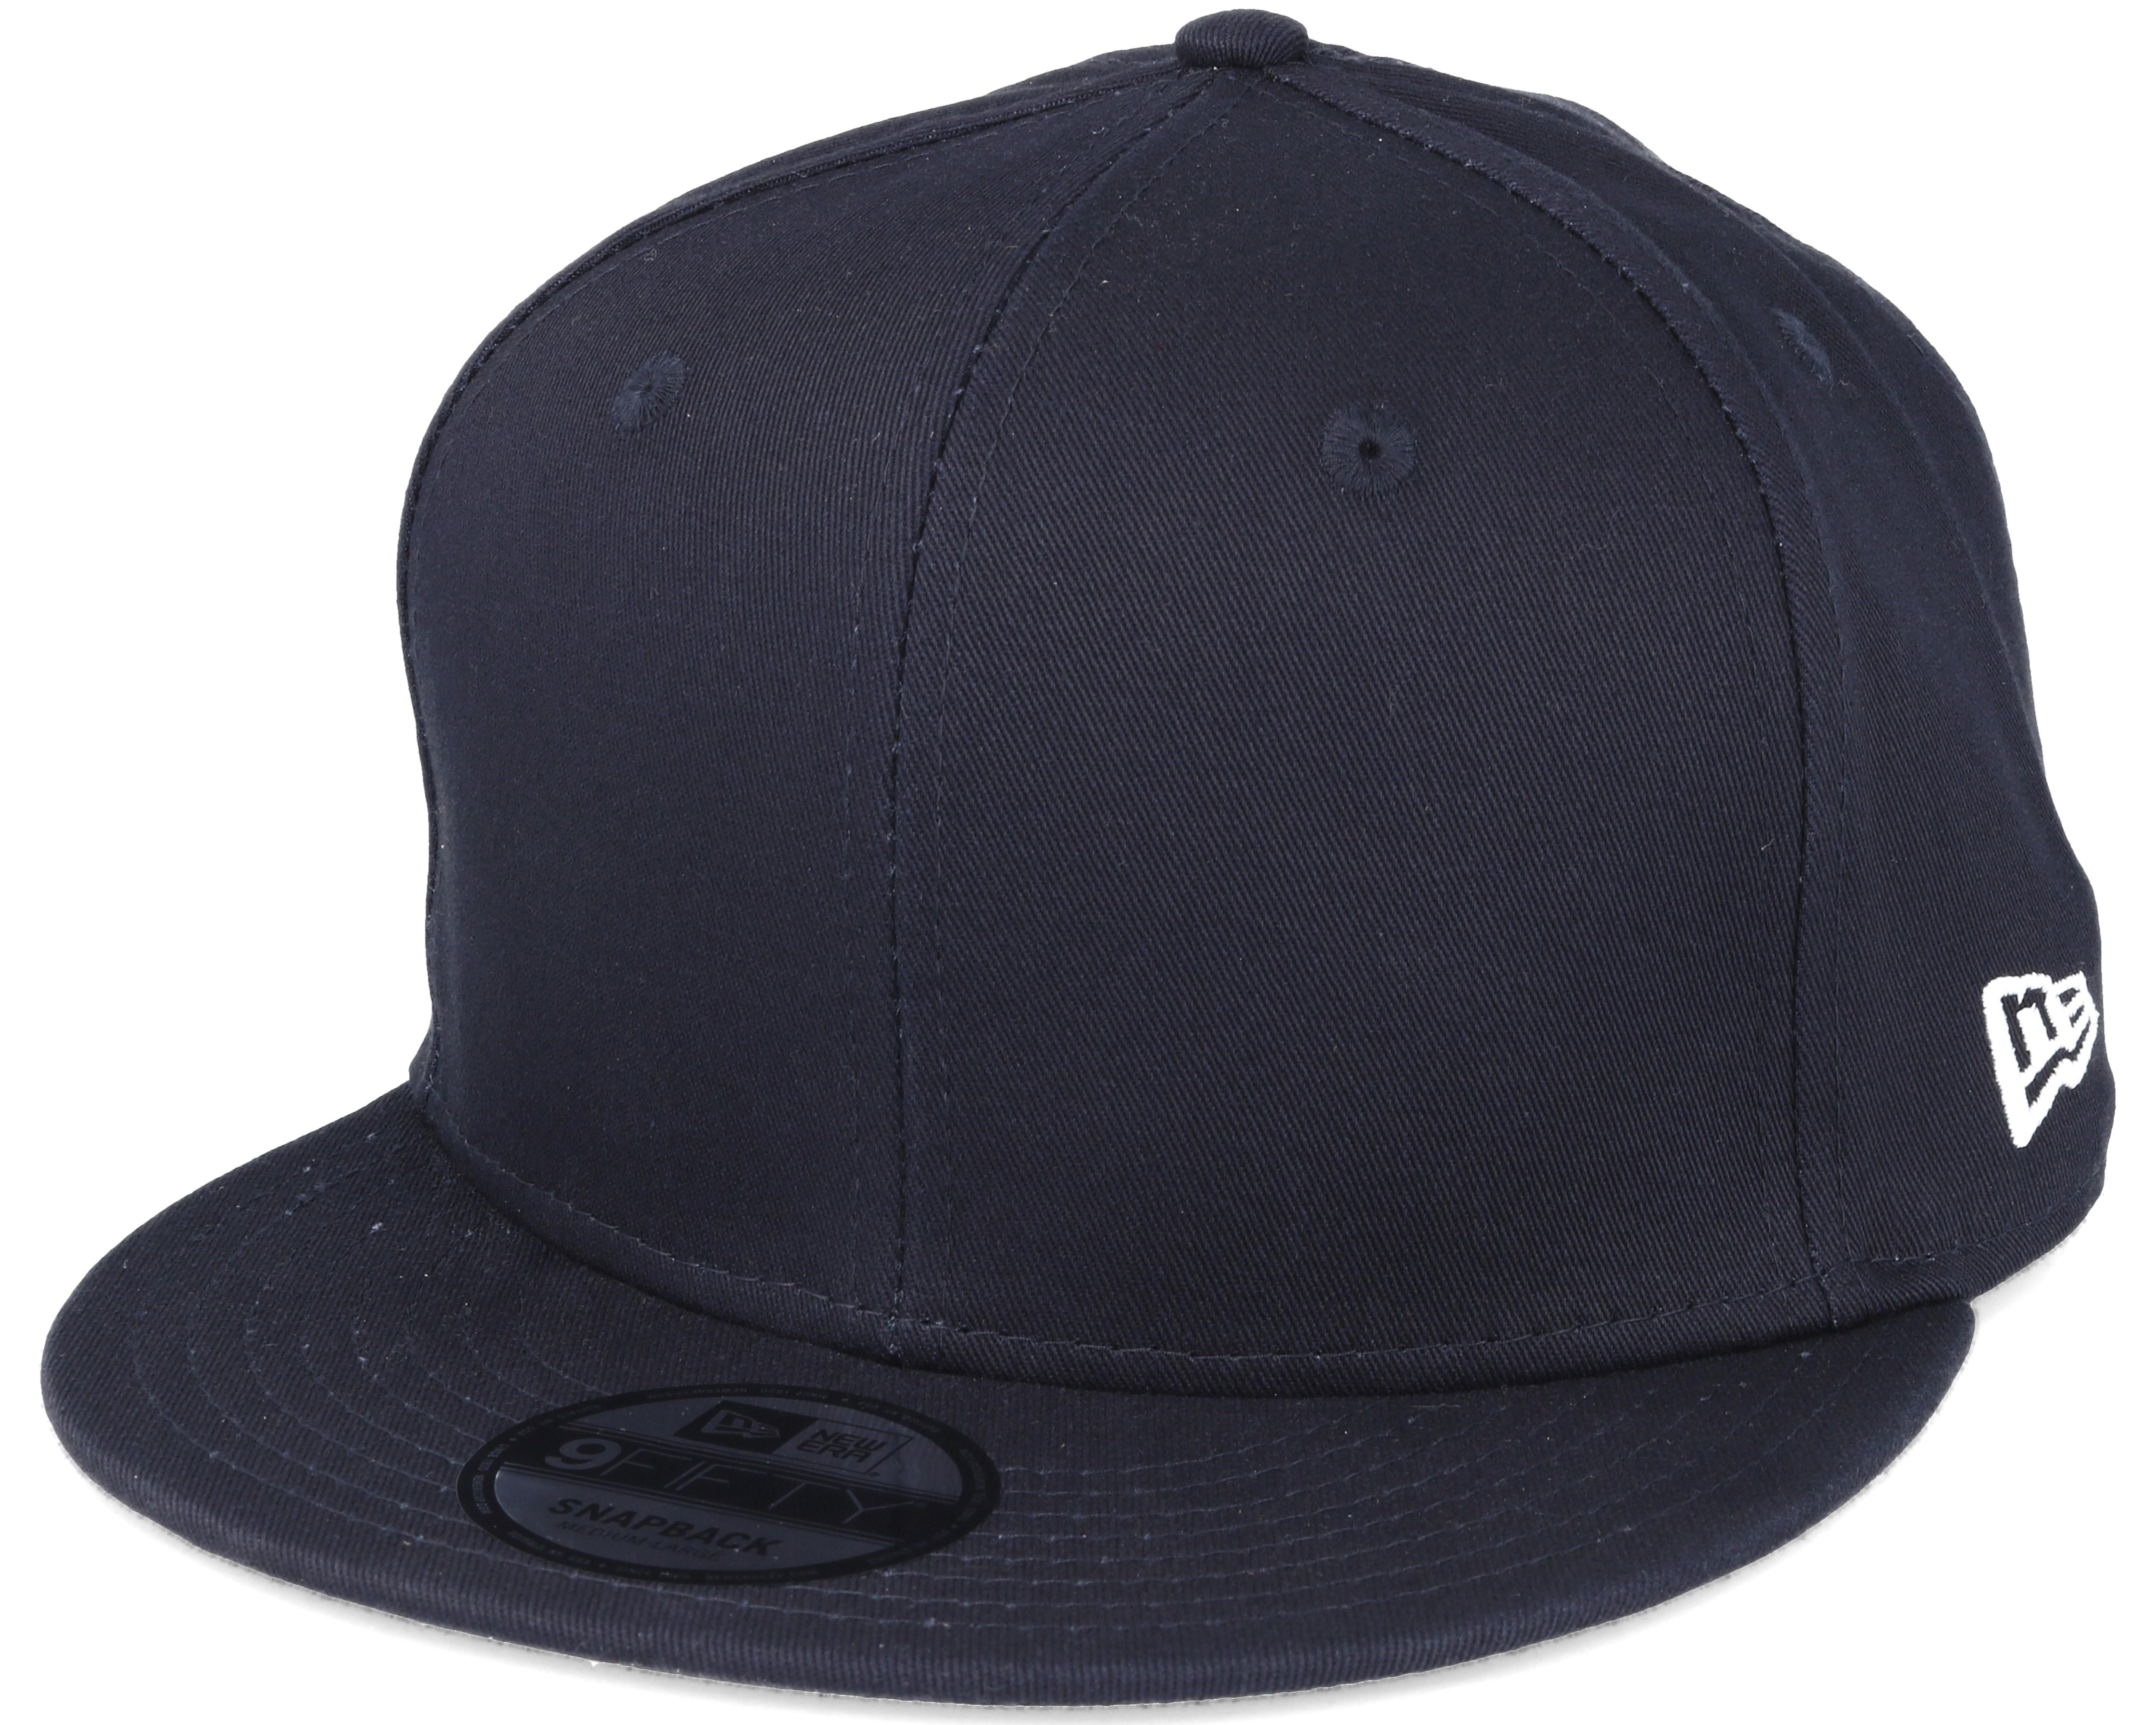 ne cotton navy 9fifty snapback new era cap. Black Bedroom Furniture Sets. Home Design Ideas